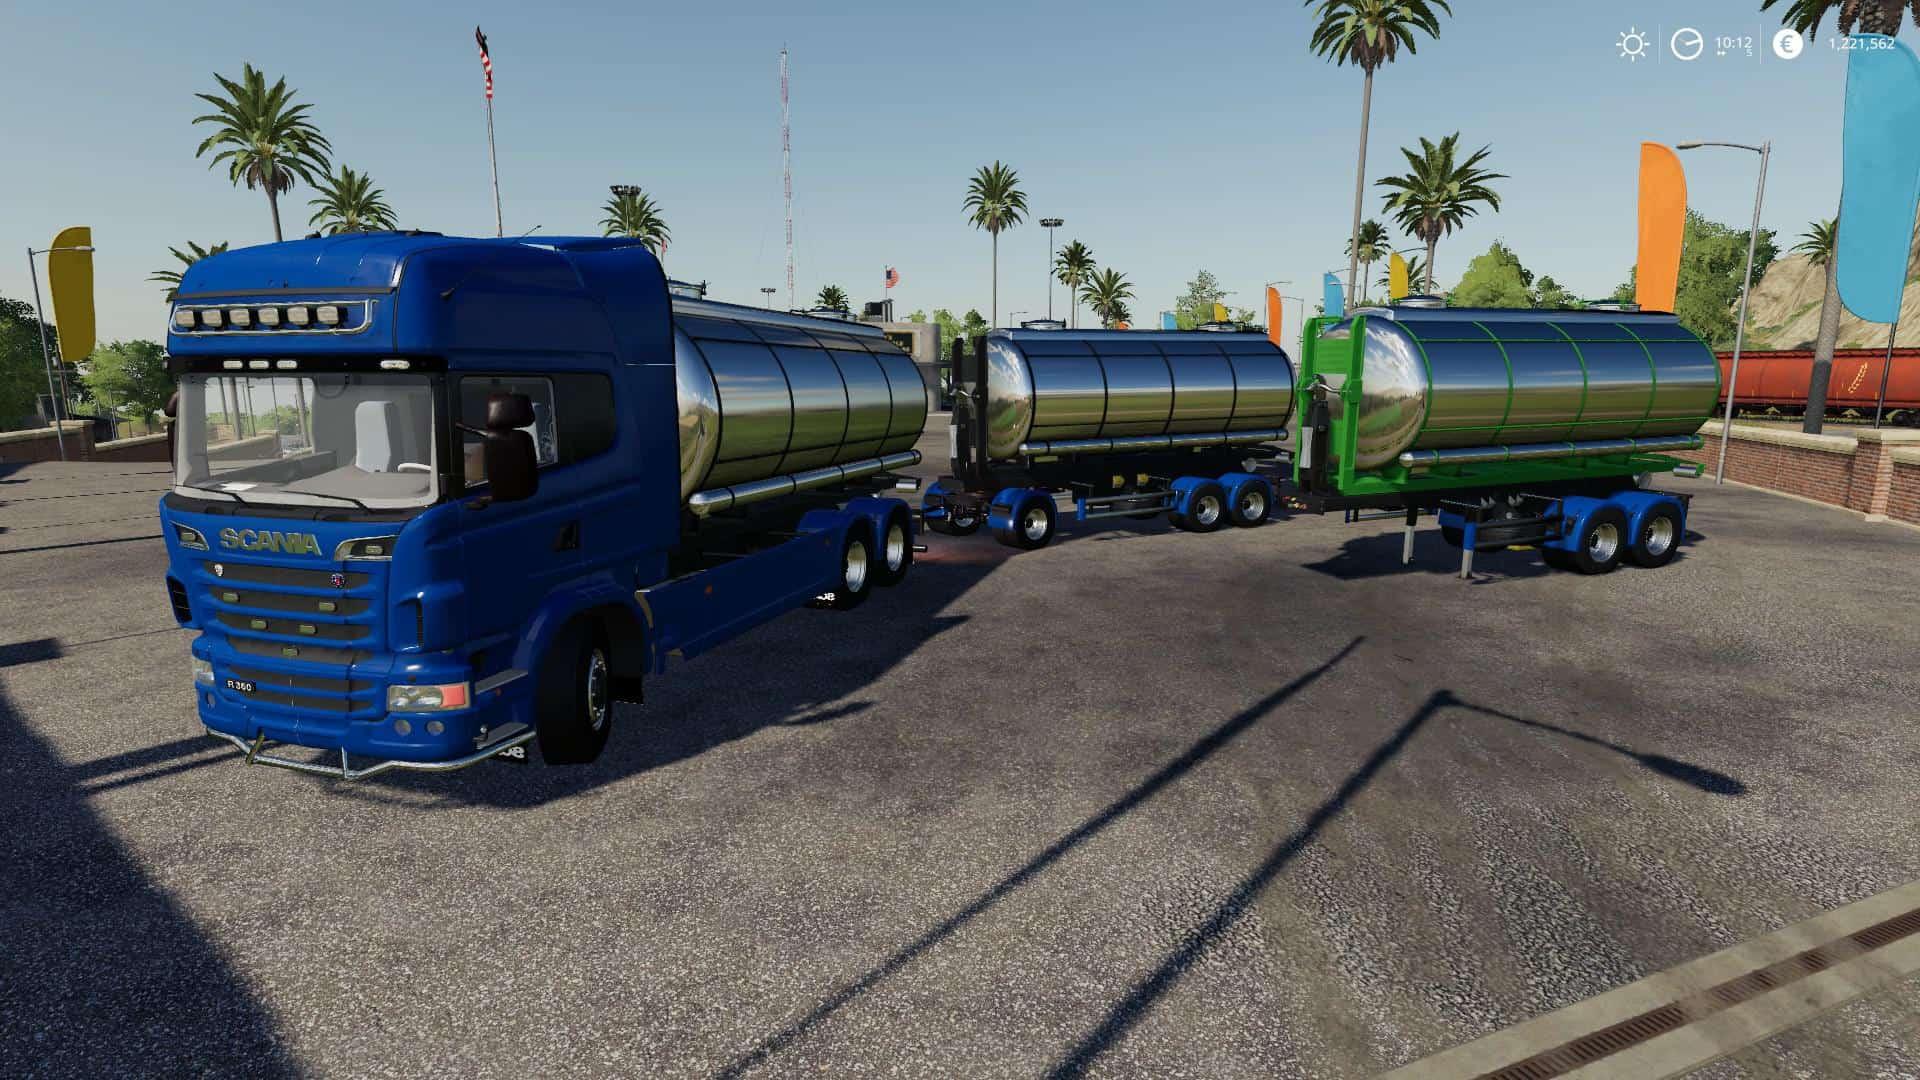 Scania R-series hooklift v1 2 0 0 Mod - Farming Simulator 19